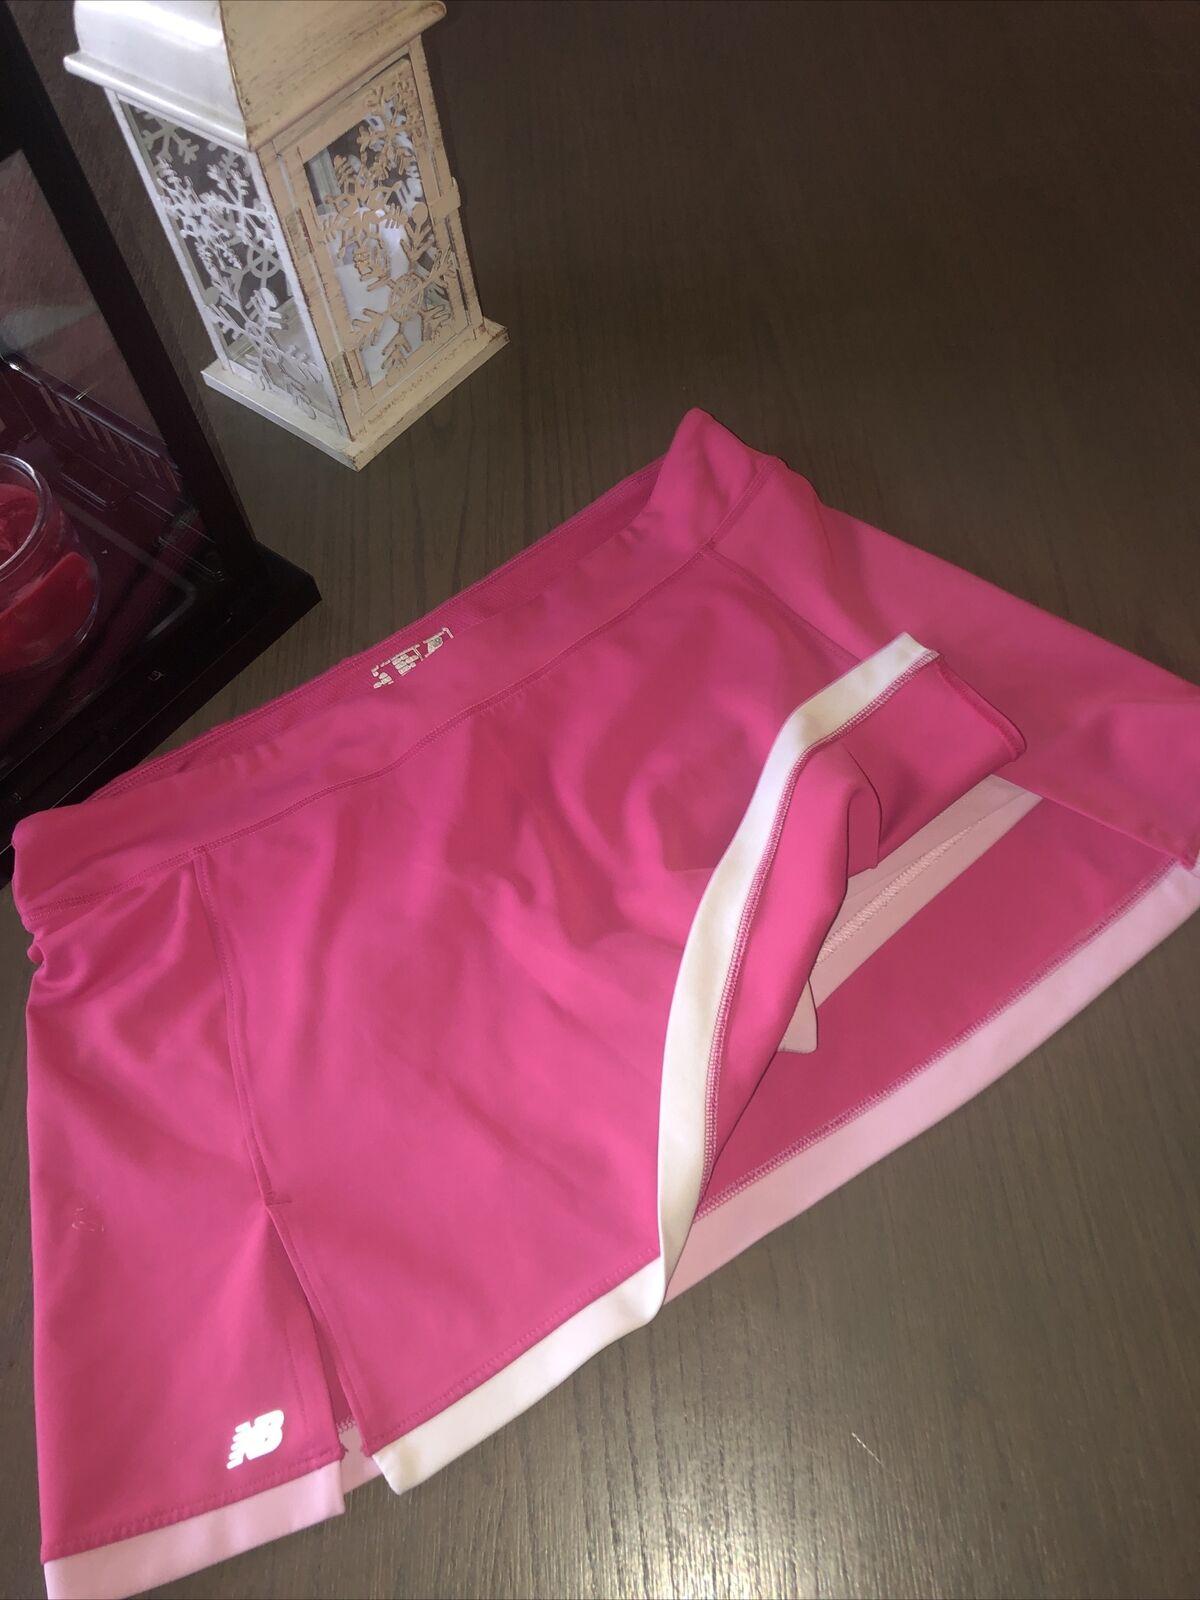 New Balance 💖 Pink athletic skort sz XL